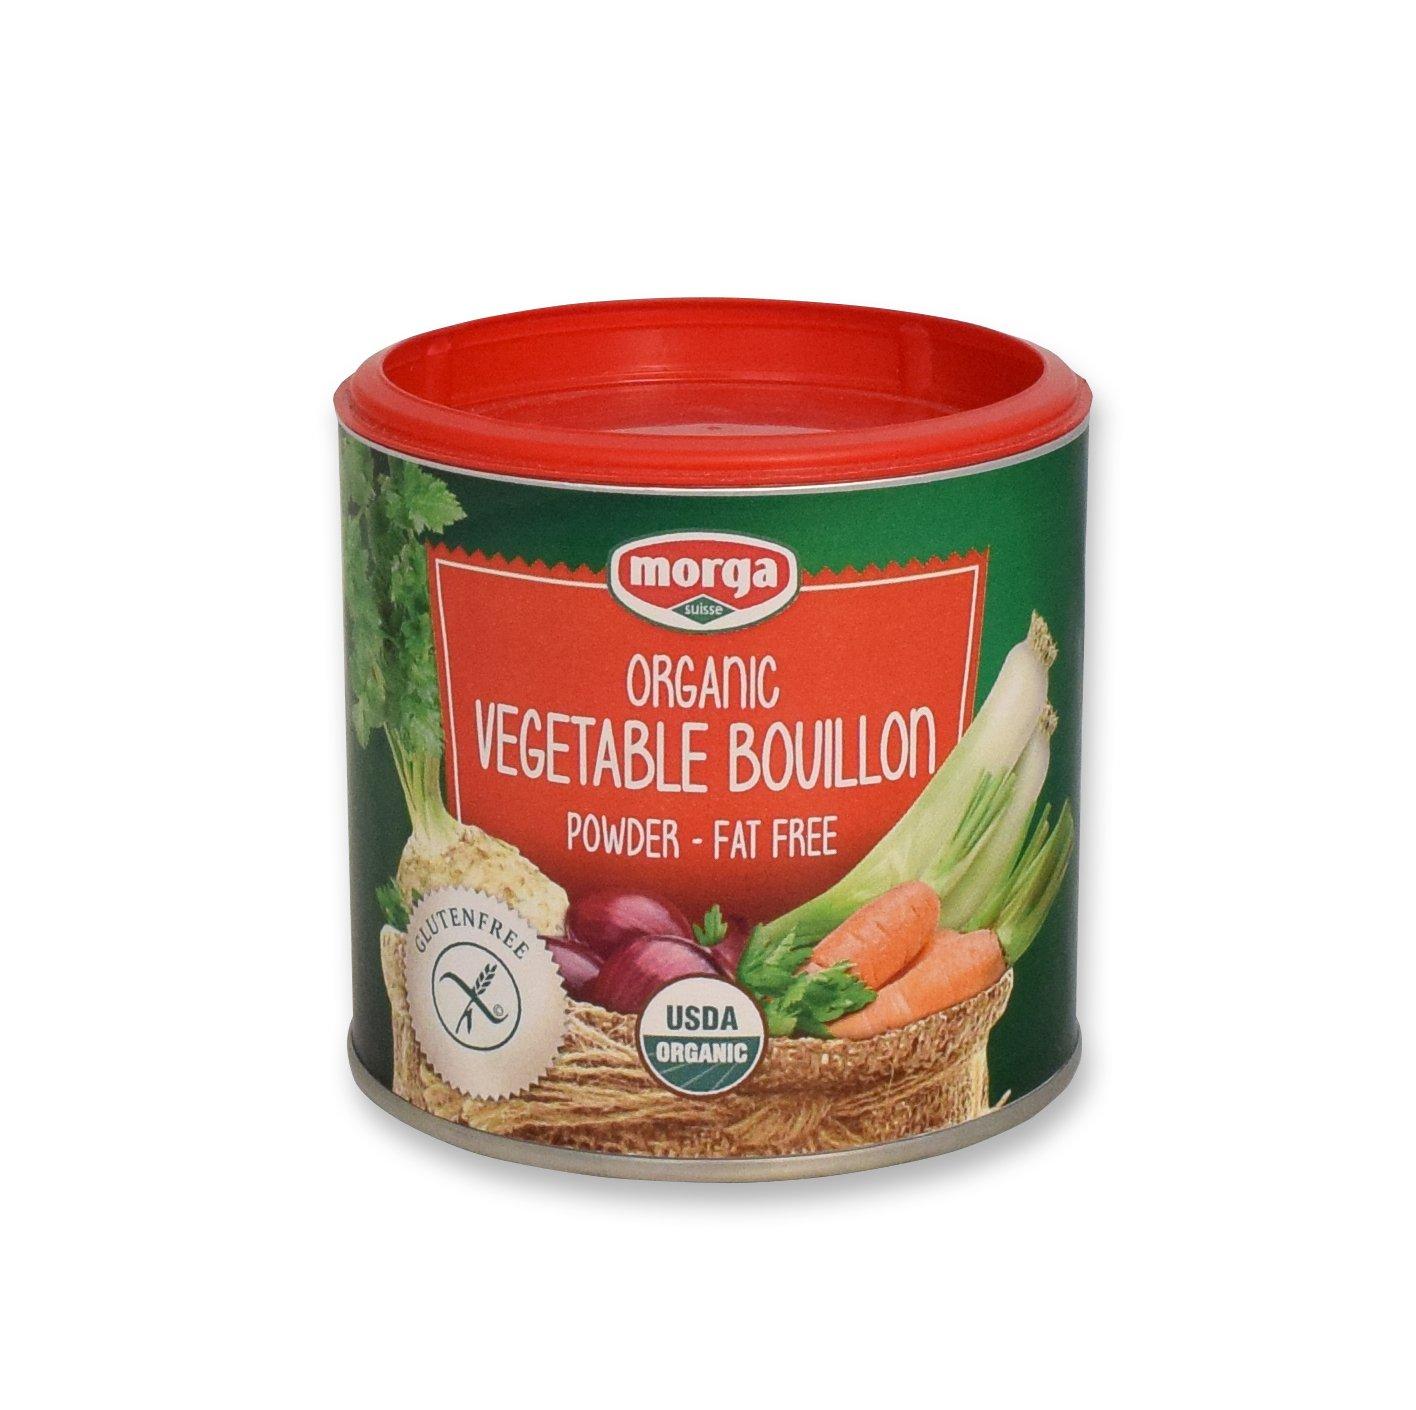 Morga USDA-ORGANIC Vegetable Bouillon Powder